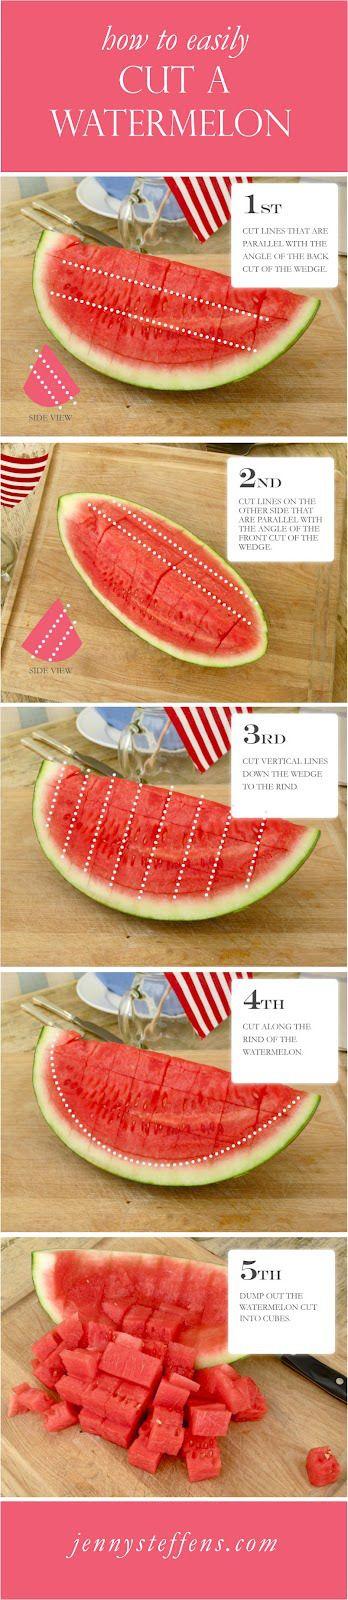 How to cut a watermelon   DIY Tag